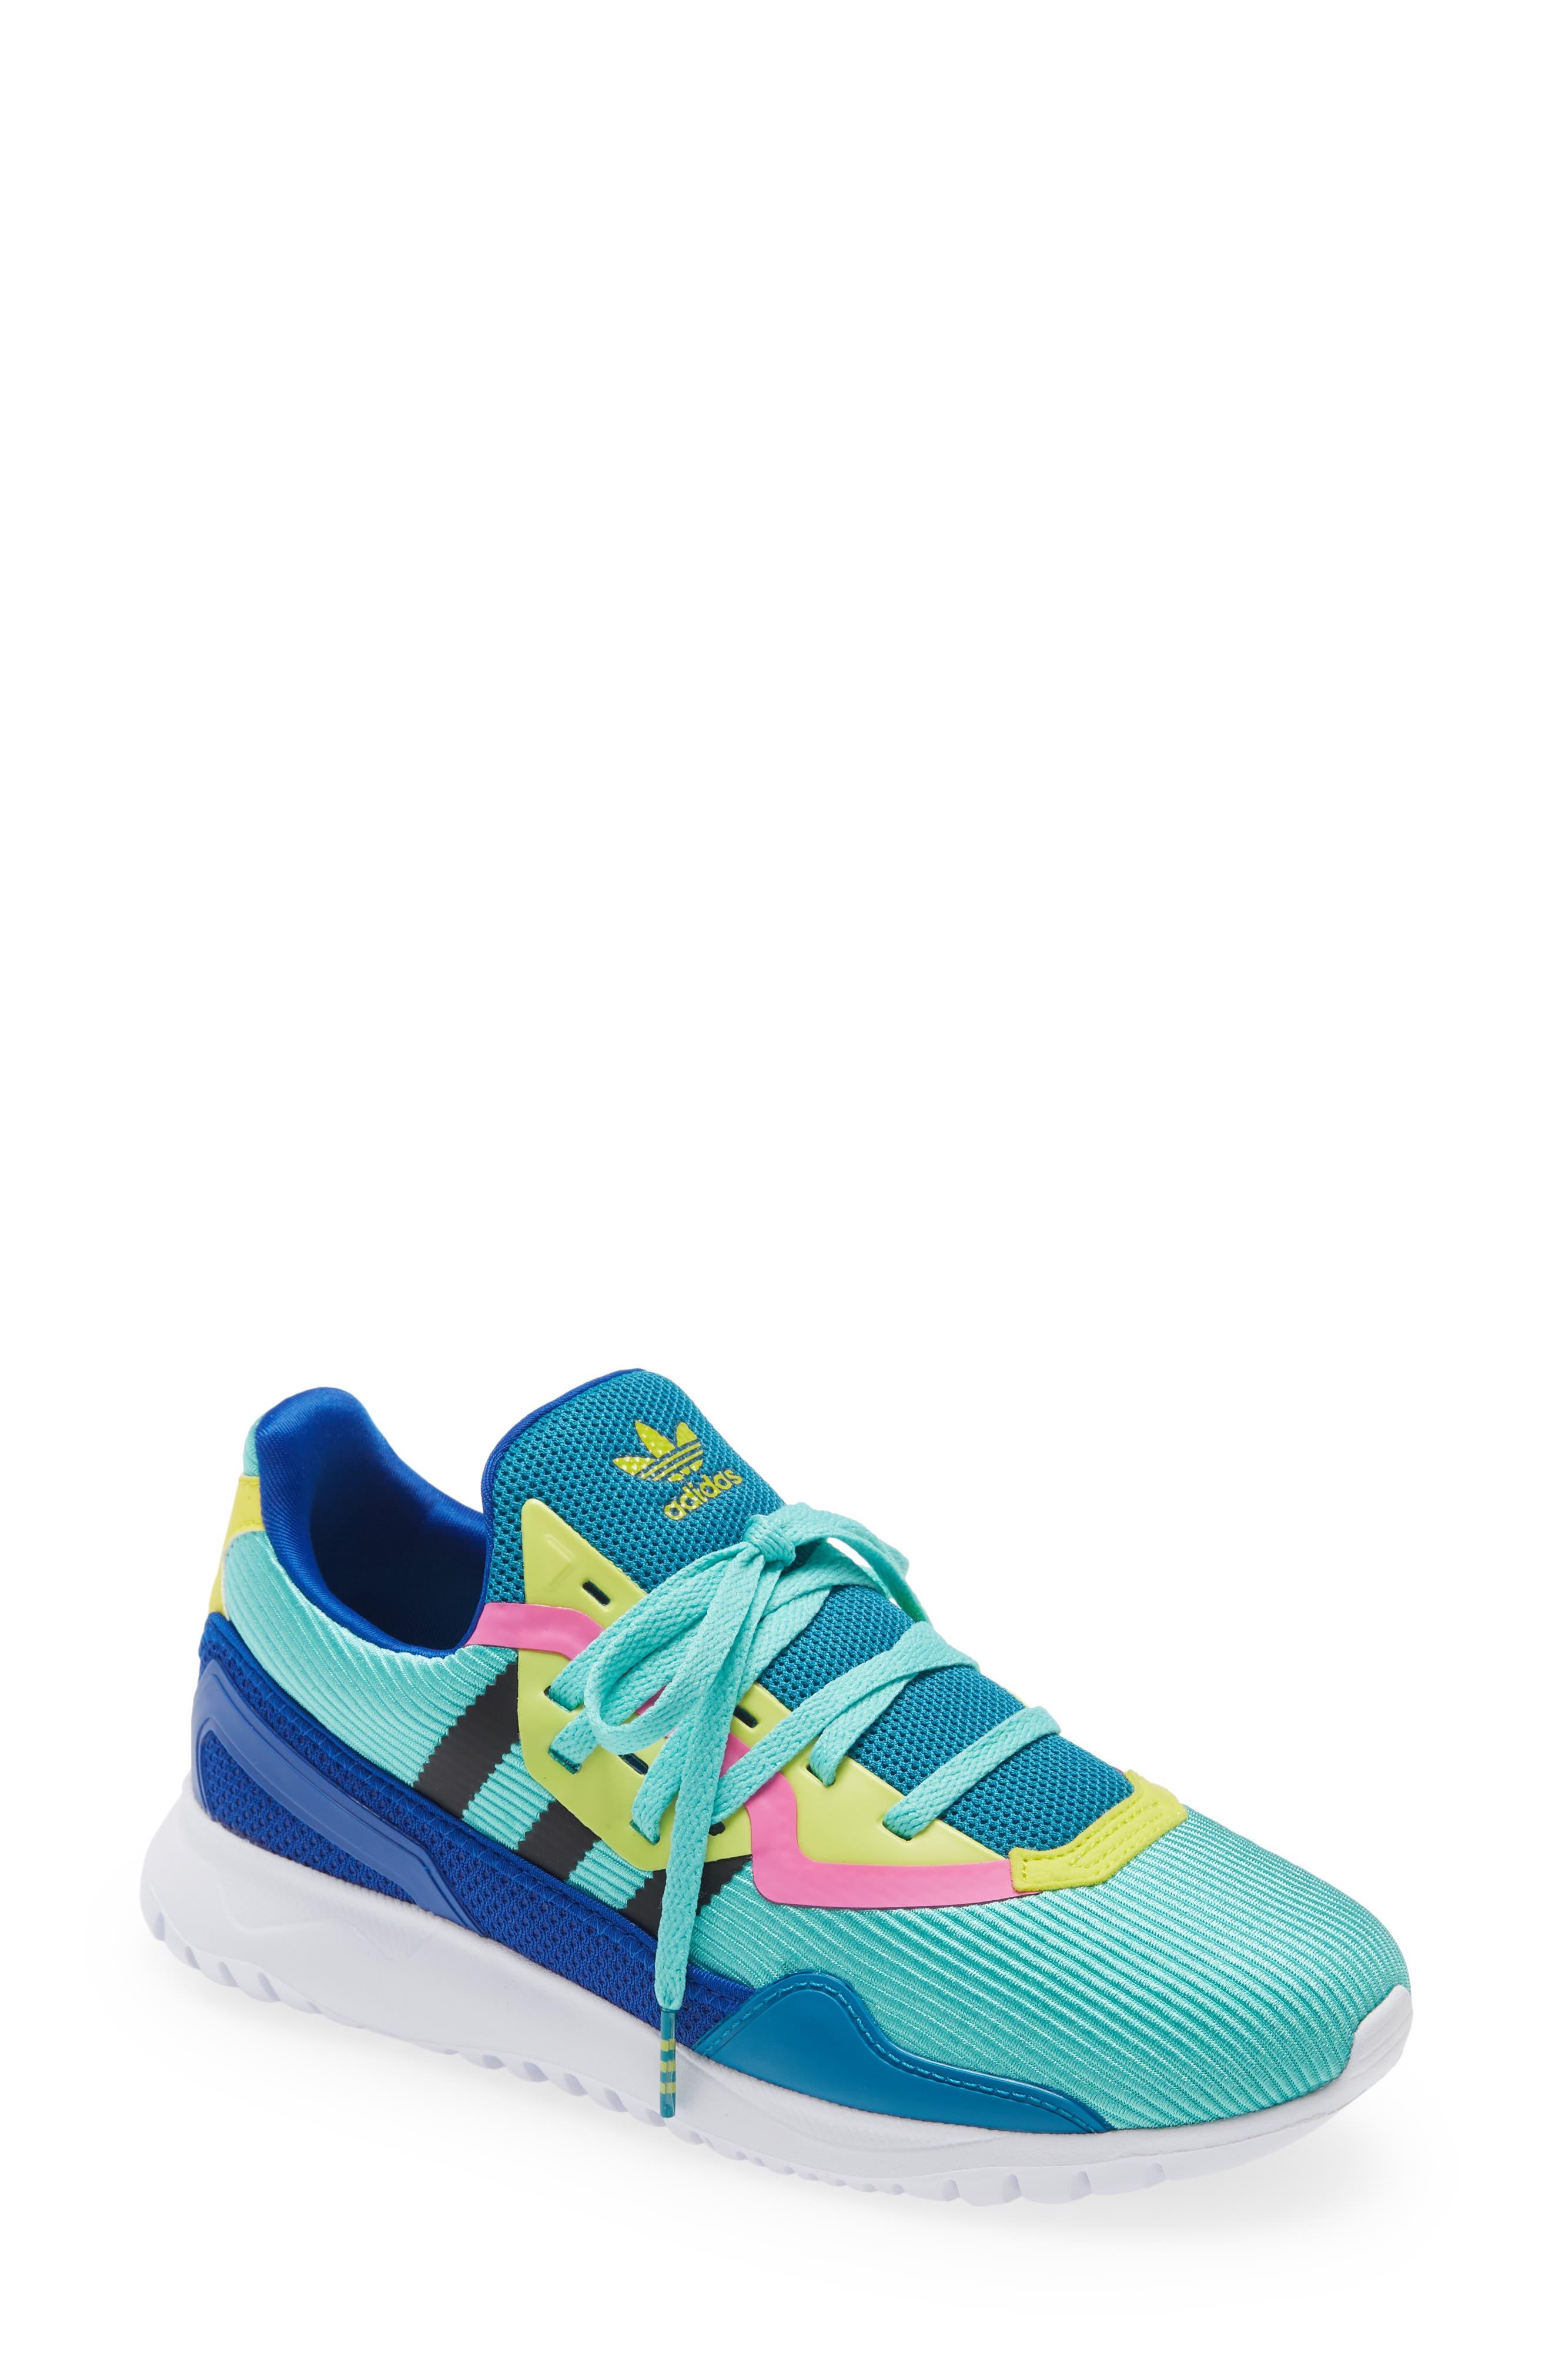 Toddler Boys' adidas Shoes (Sizes 7.5-12)